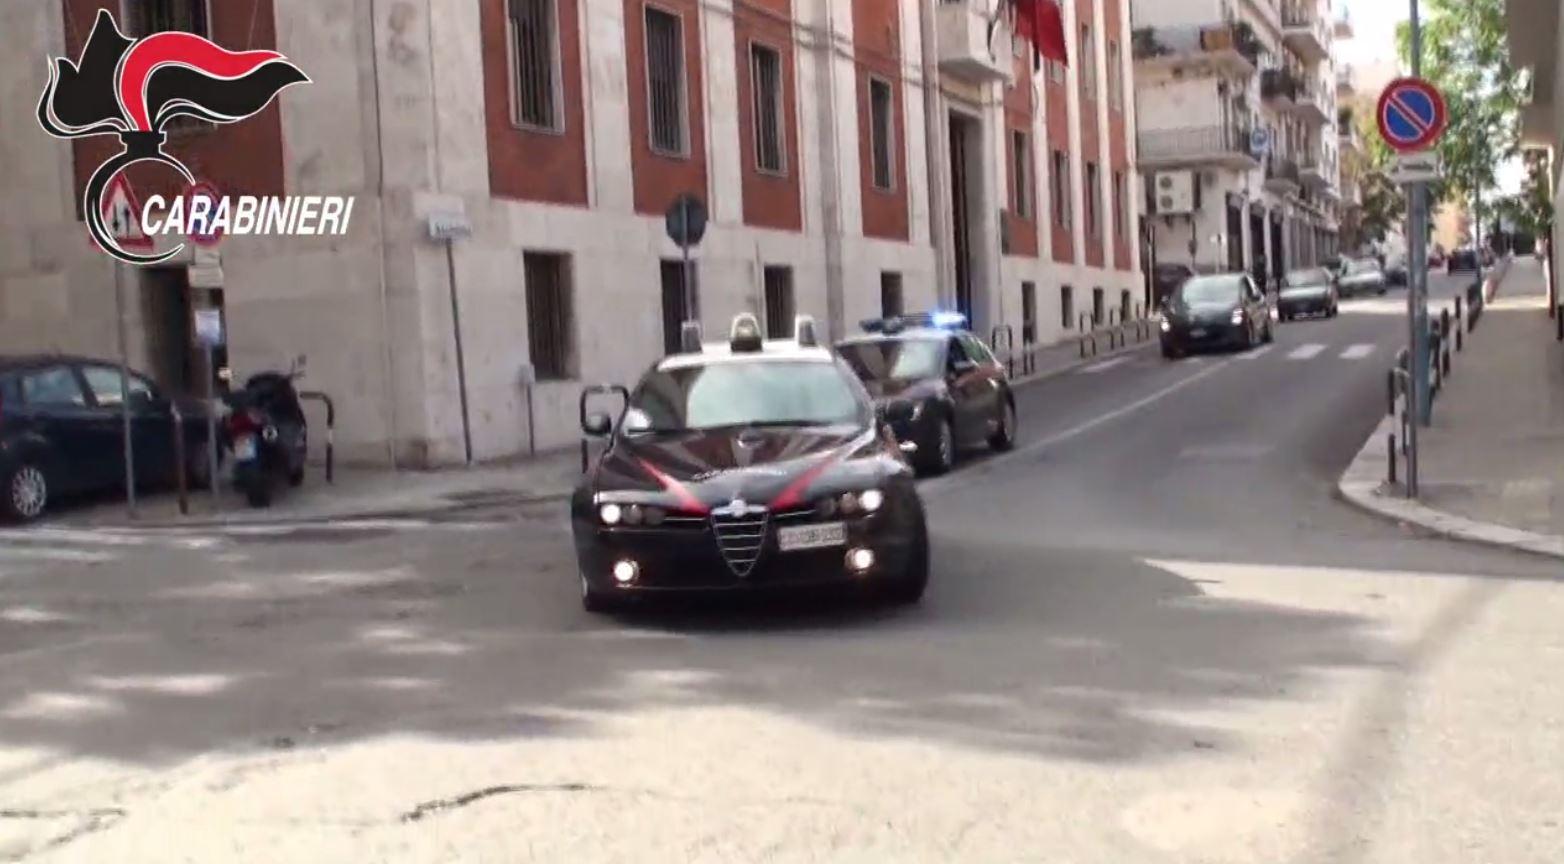 'Ndrangheta: blitz contro clan Condello, 26 fermi